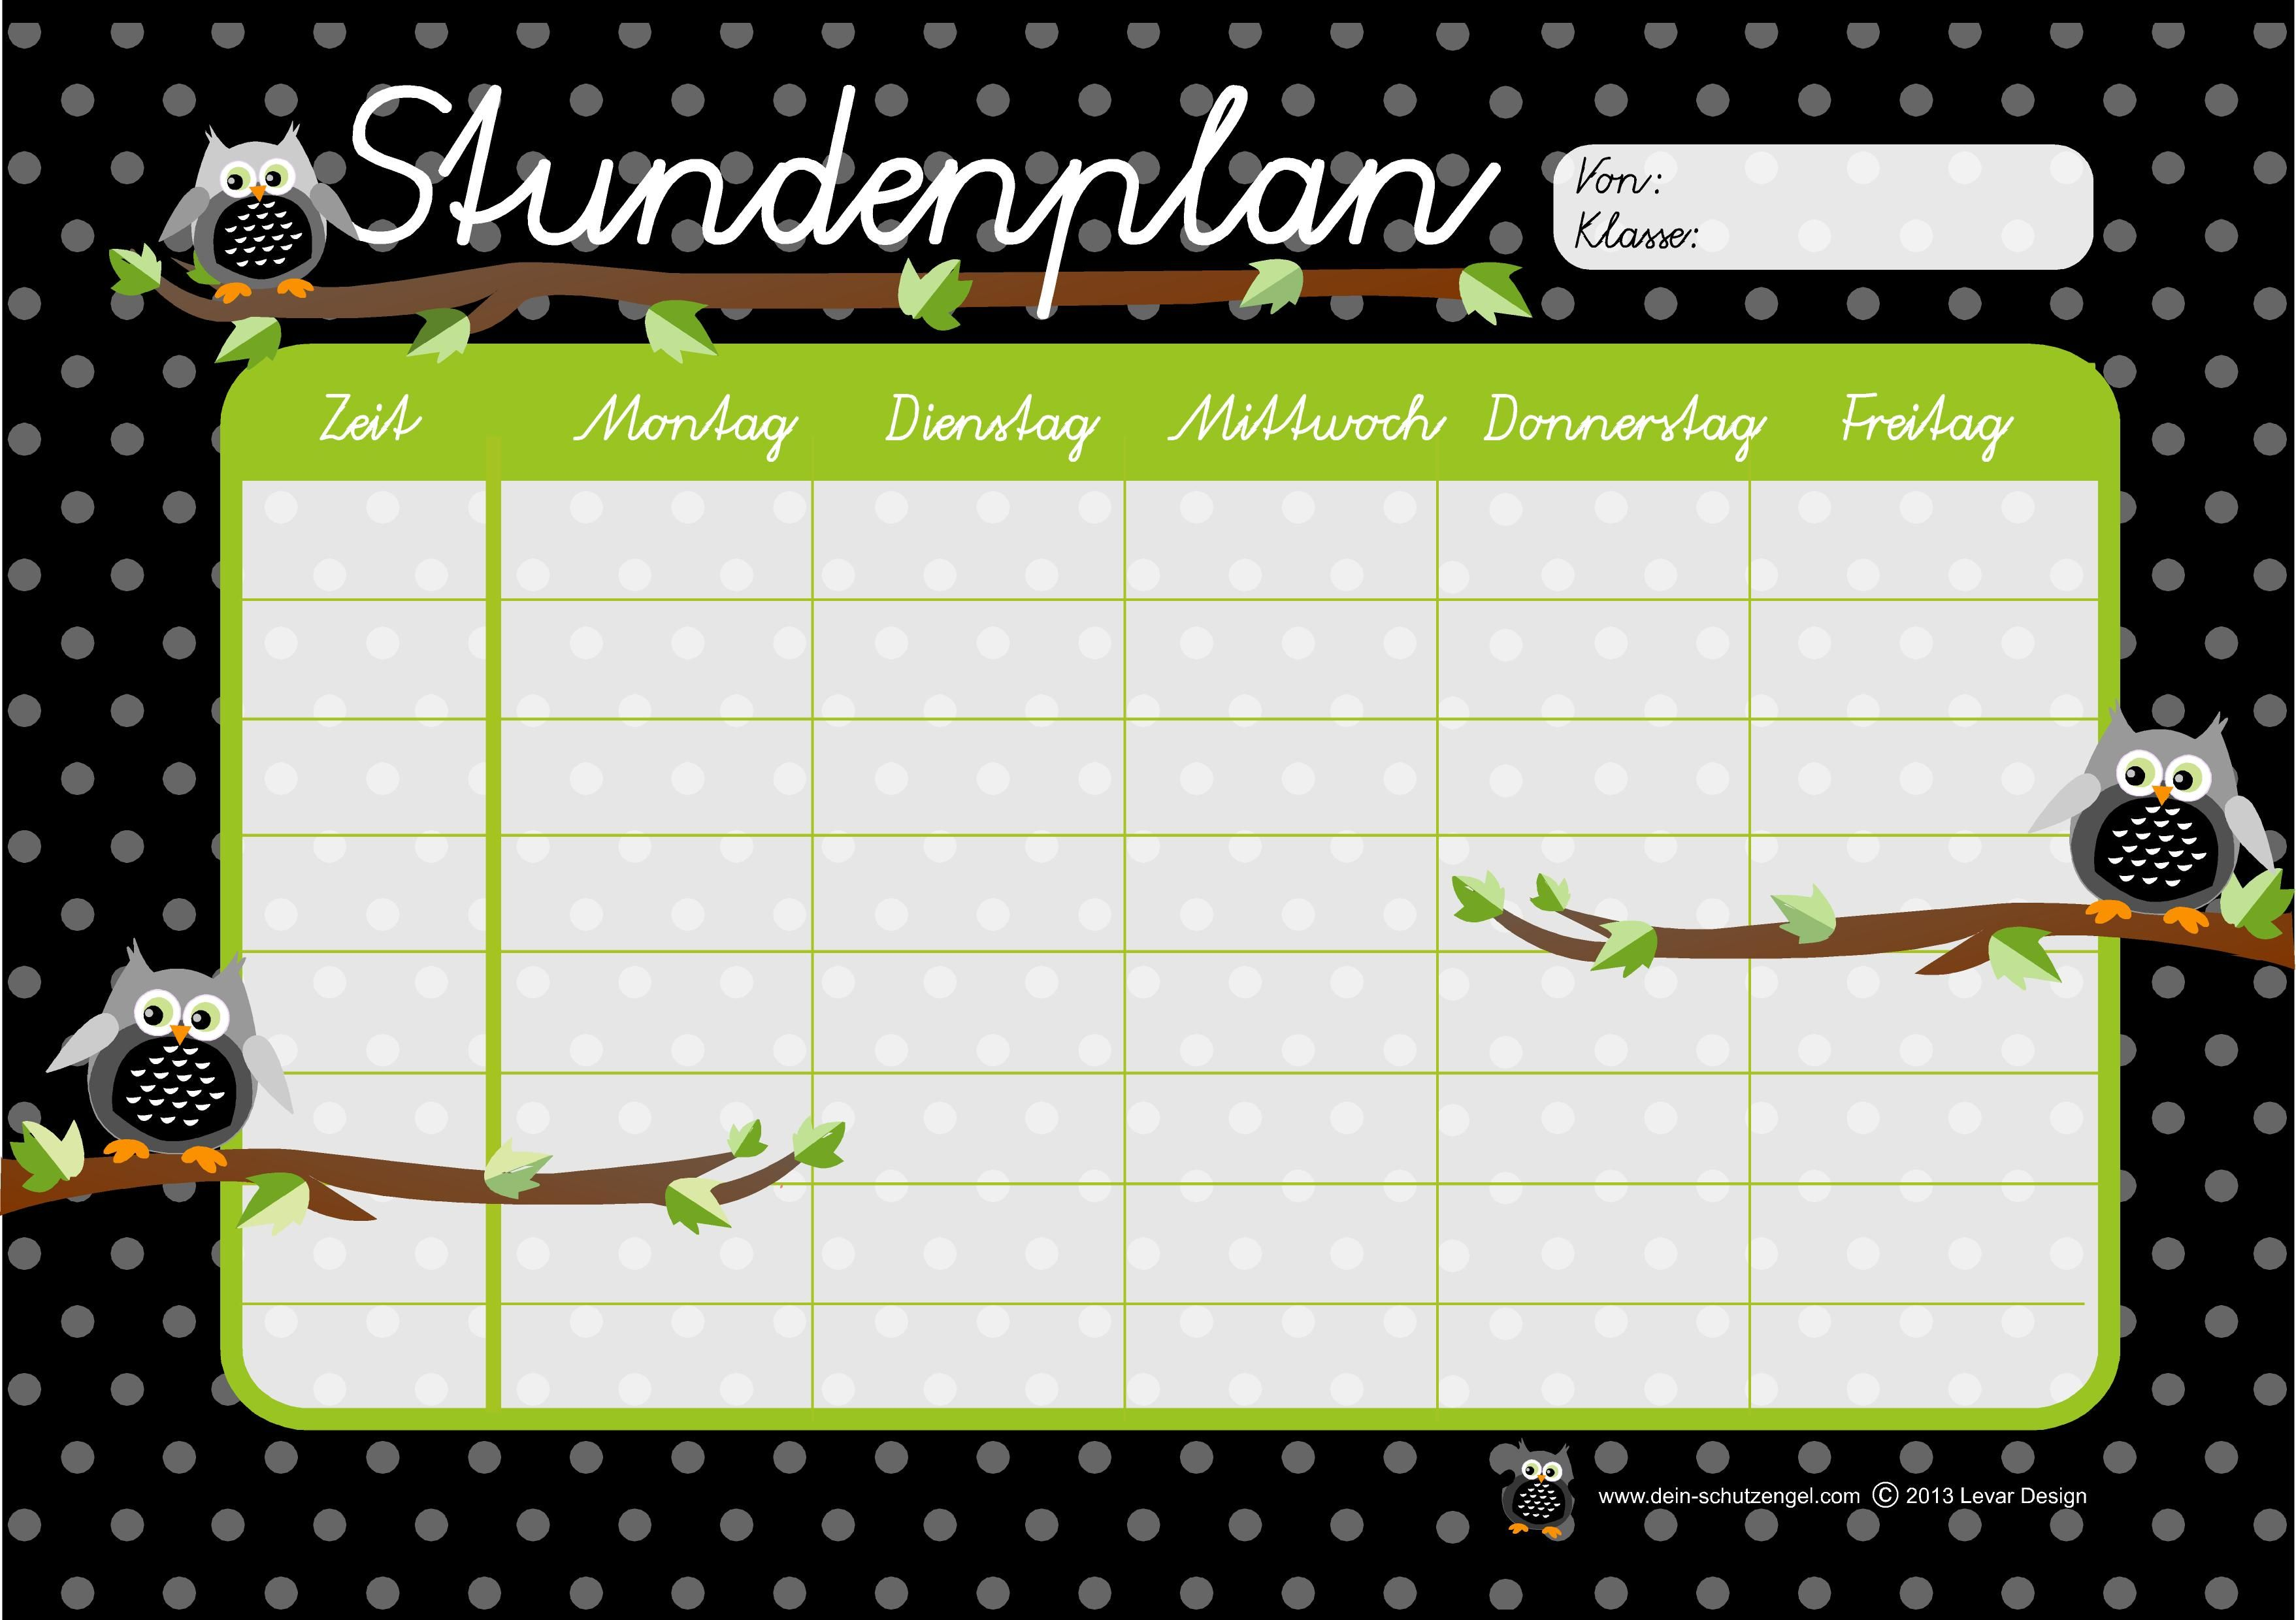 Stundenplan Motiv Eulen   School & Office   Pinterest   School ...